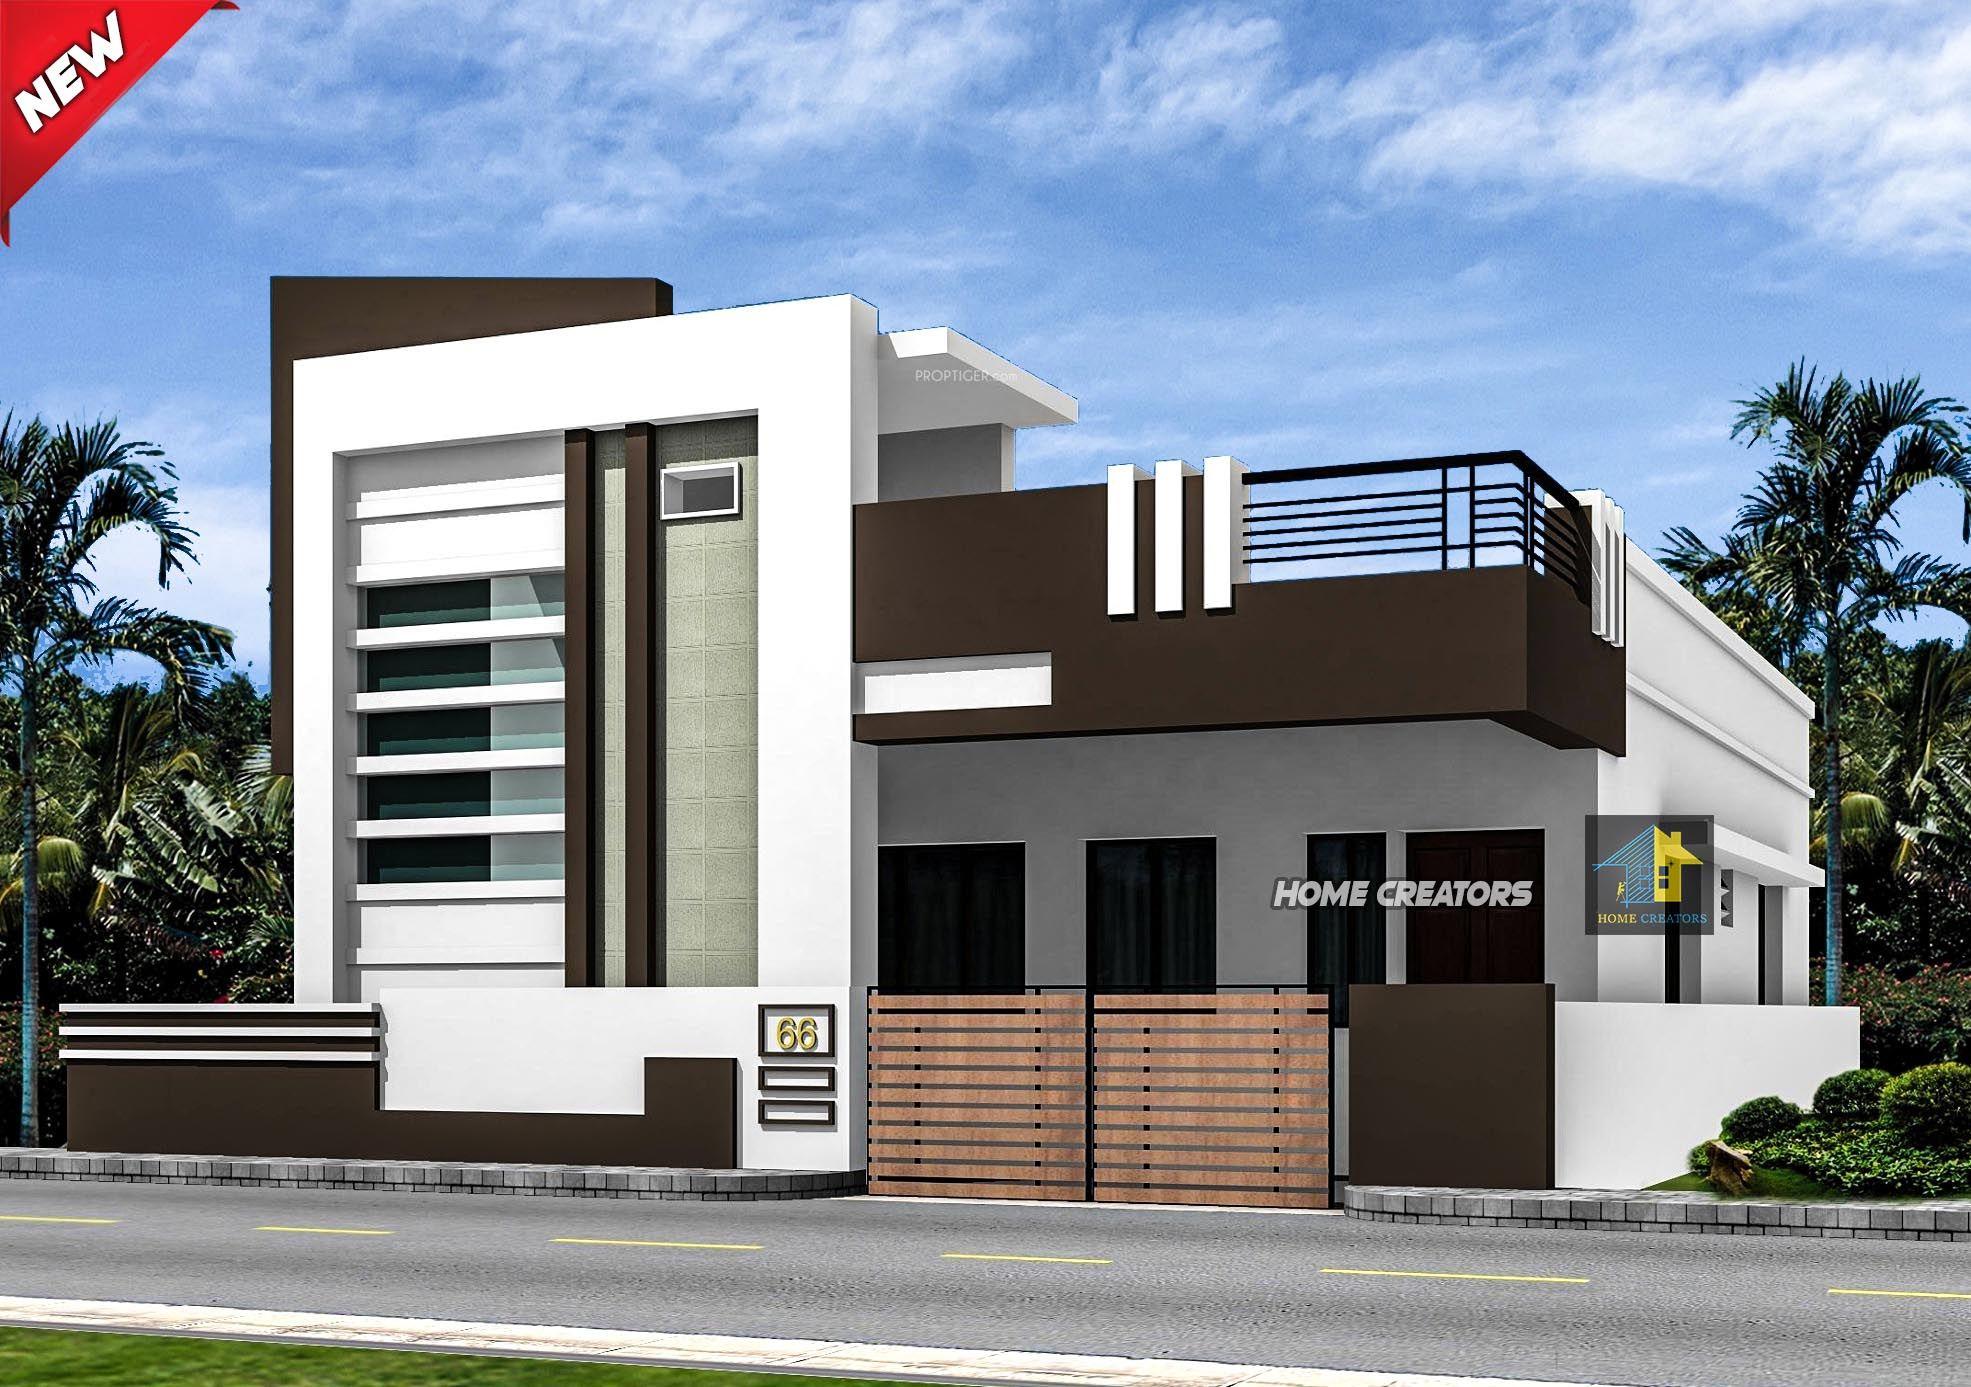 Ground Floor Elevation Designs House Balcony Design Small House Front Design Small House Elevation Design